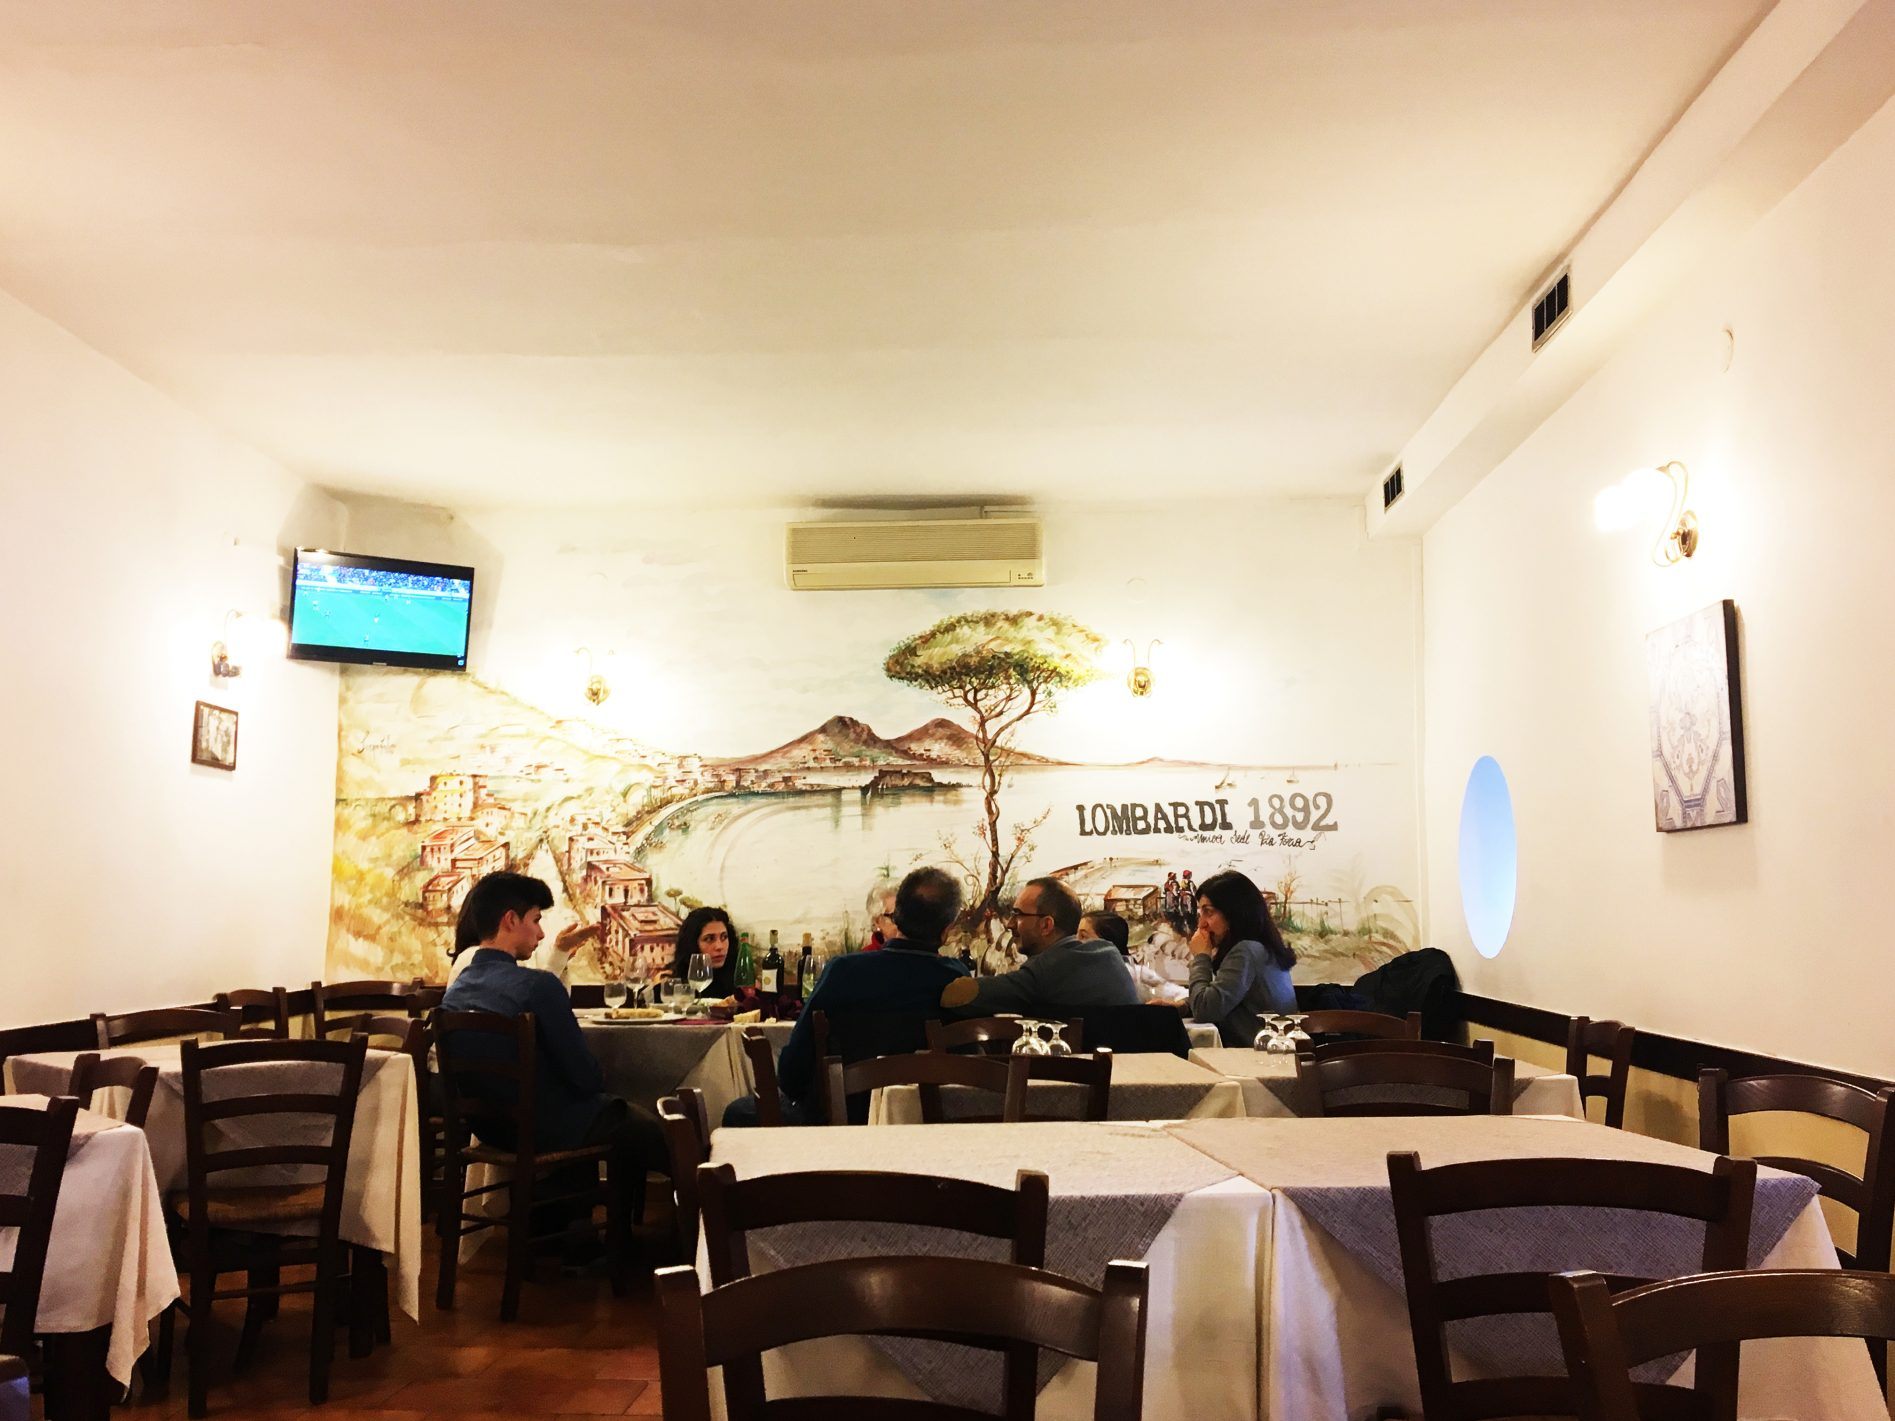 naples_lombardi_restaurantIMG_7602 copie